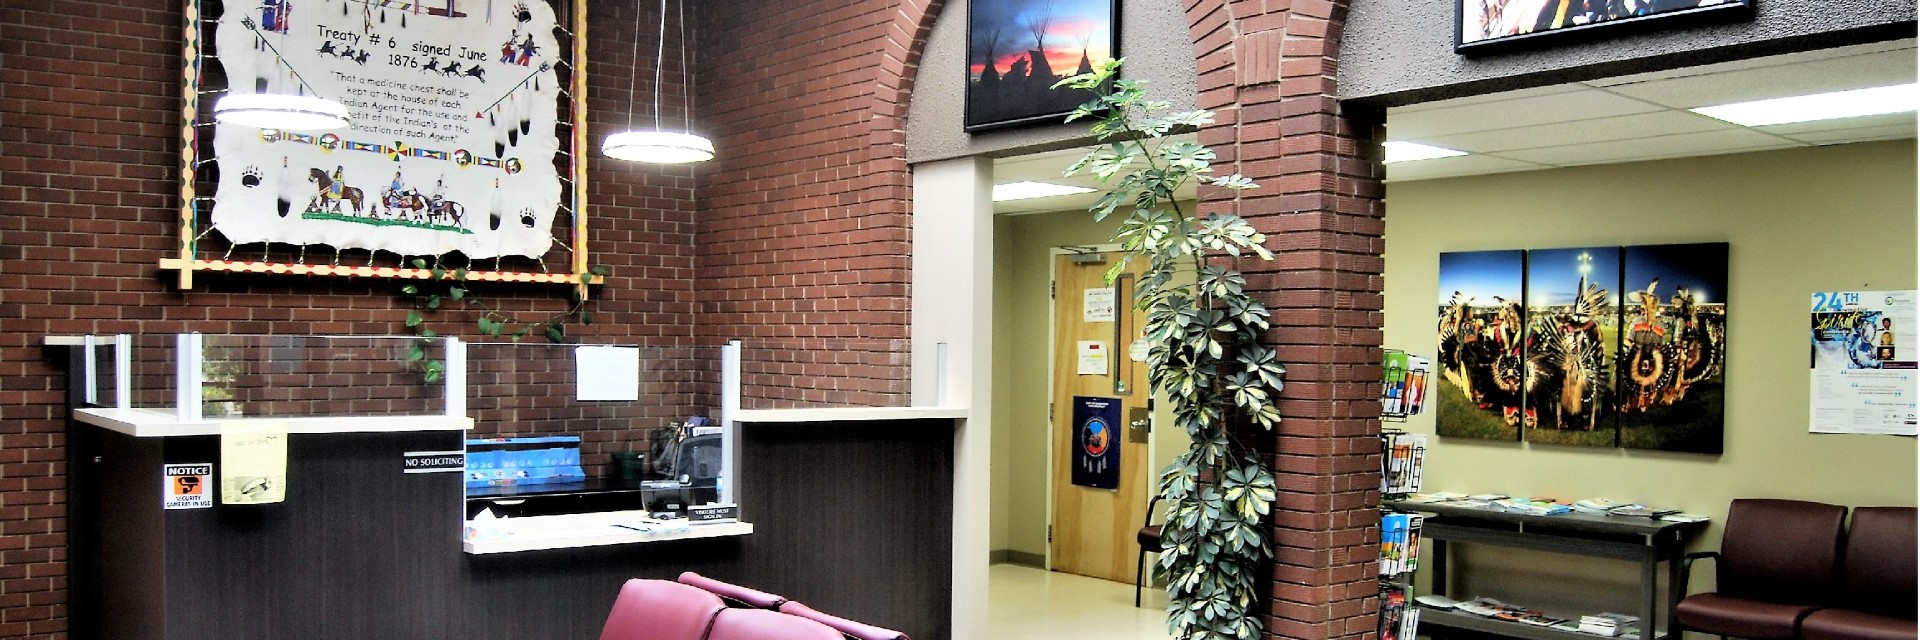 Health Centre Entrance